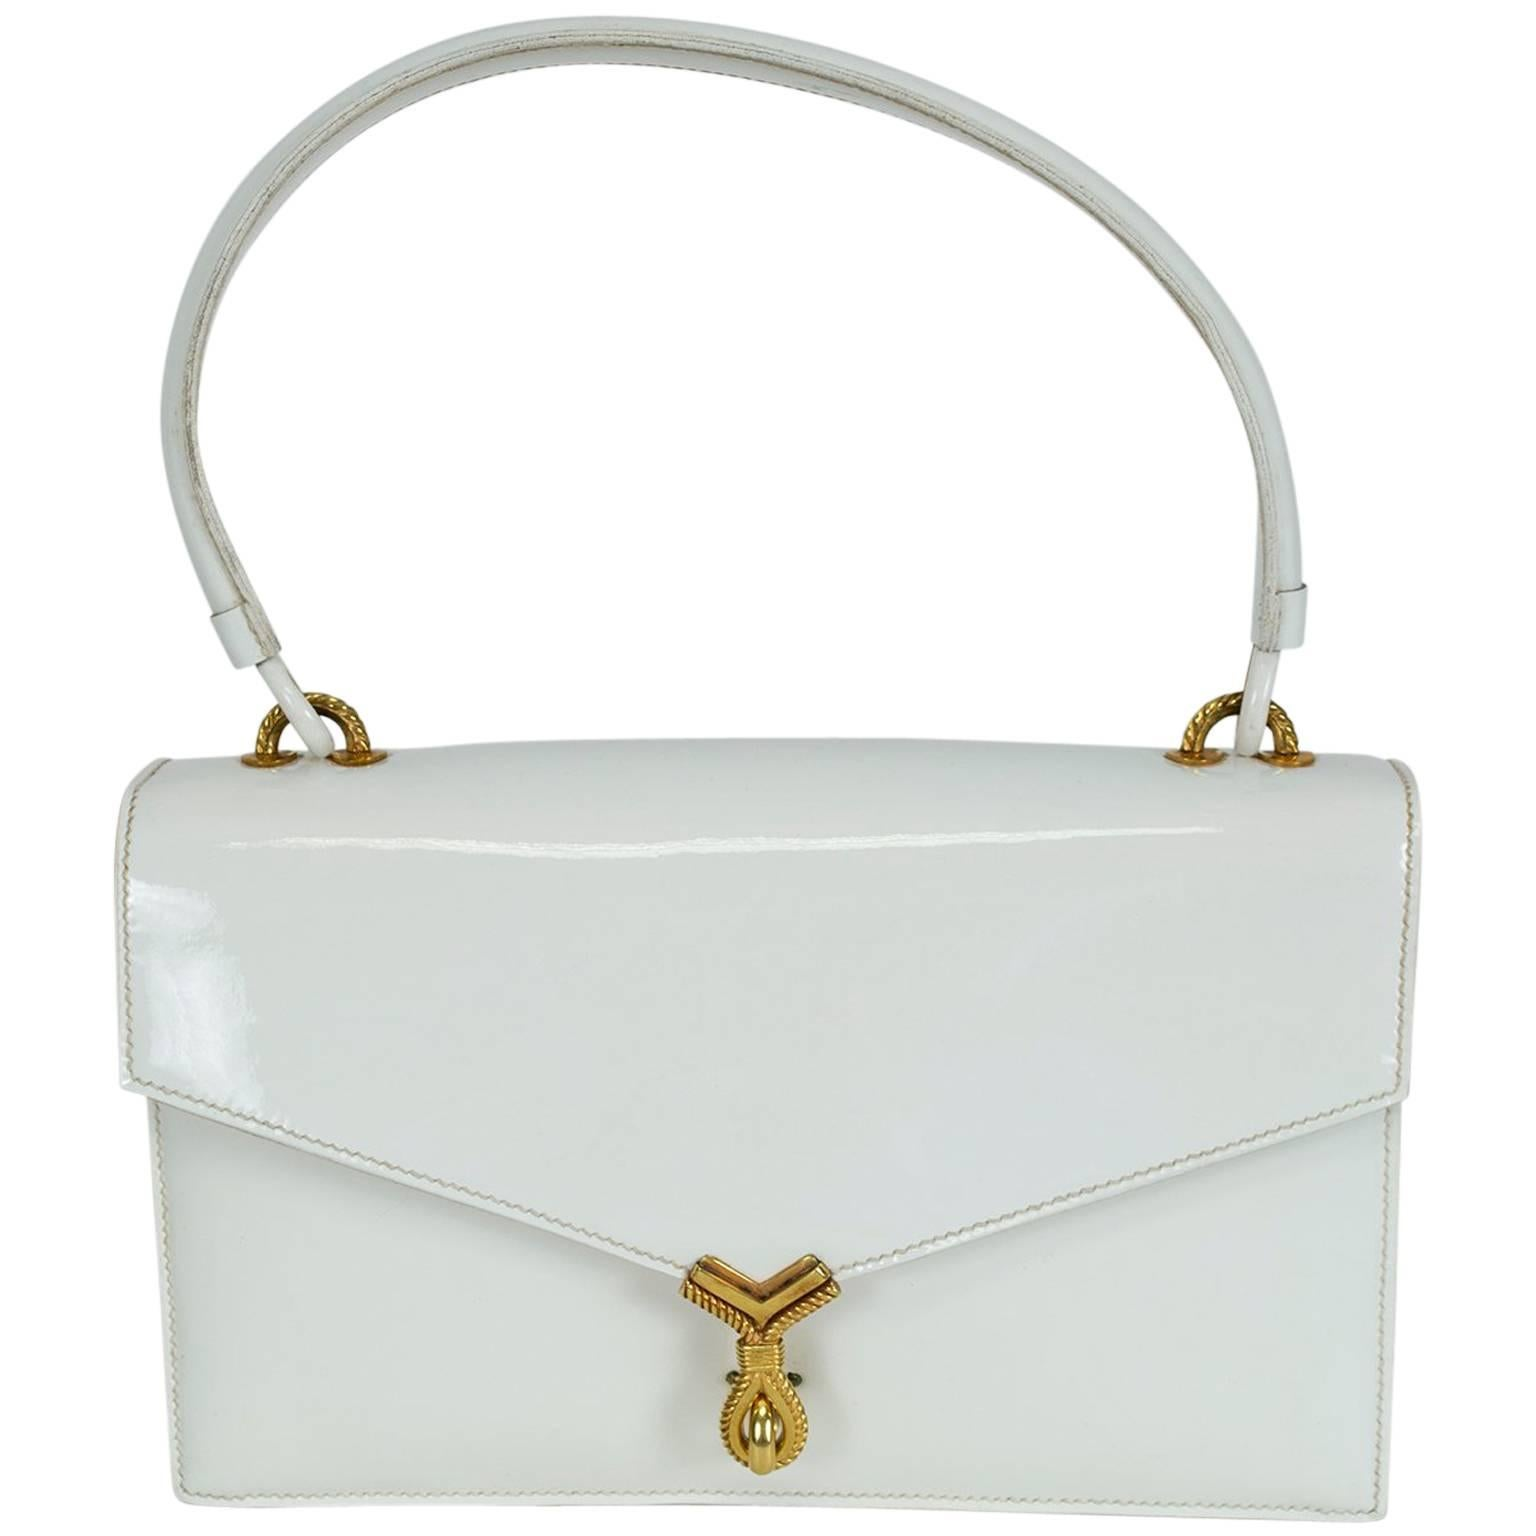 Vintage Hermès Sac Cordelière White Patent Leather Envelope Handbag- 25 cm, 1951